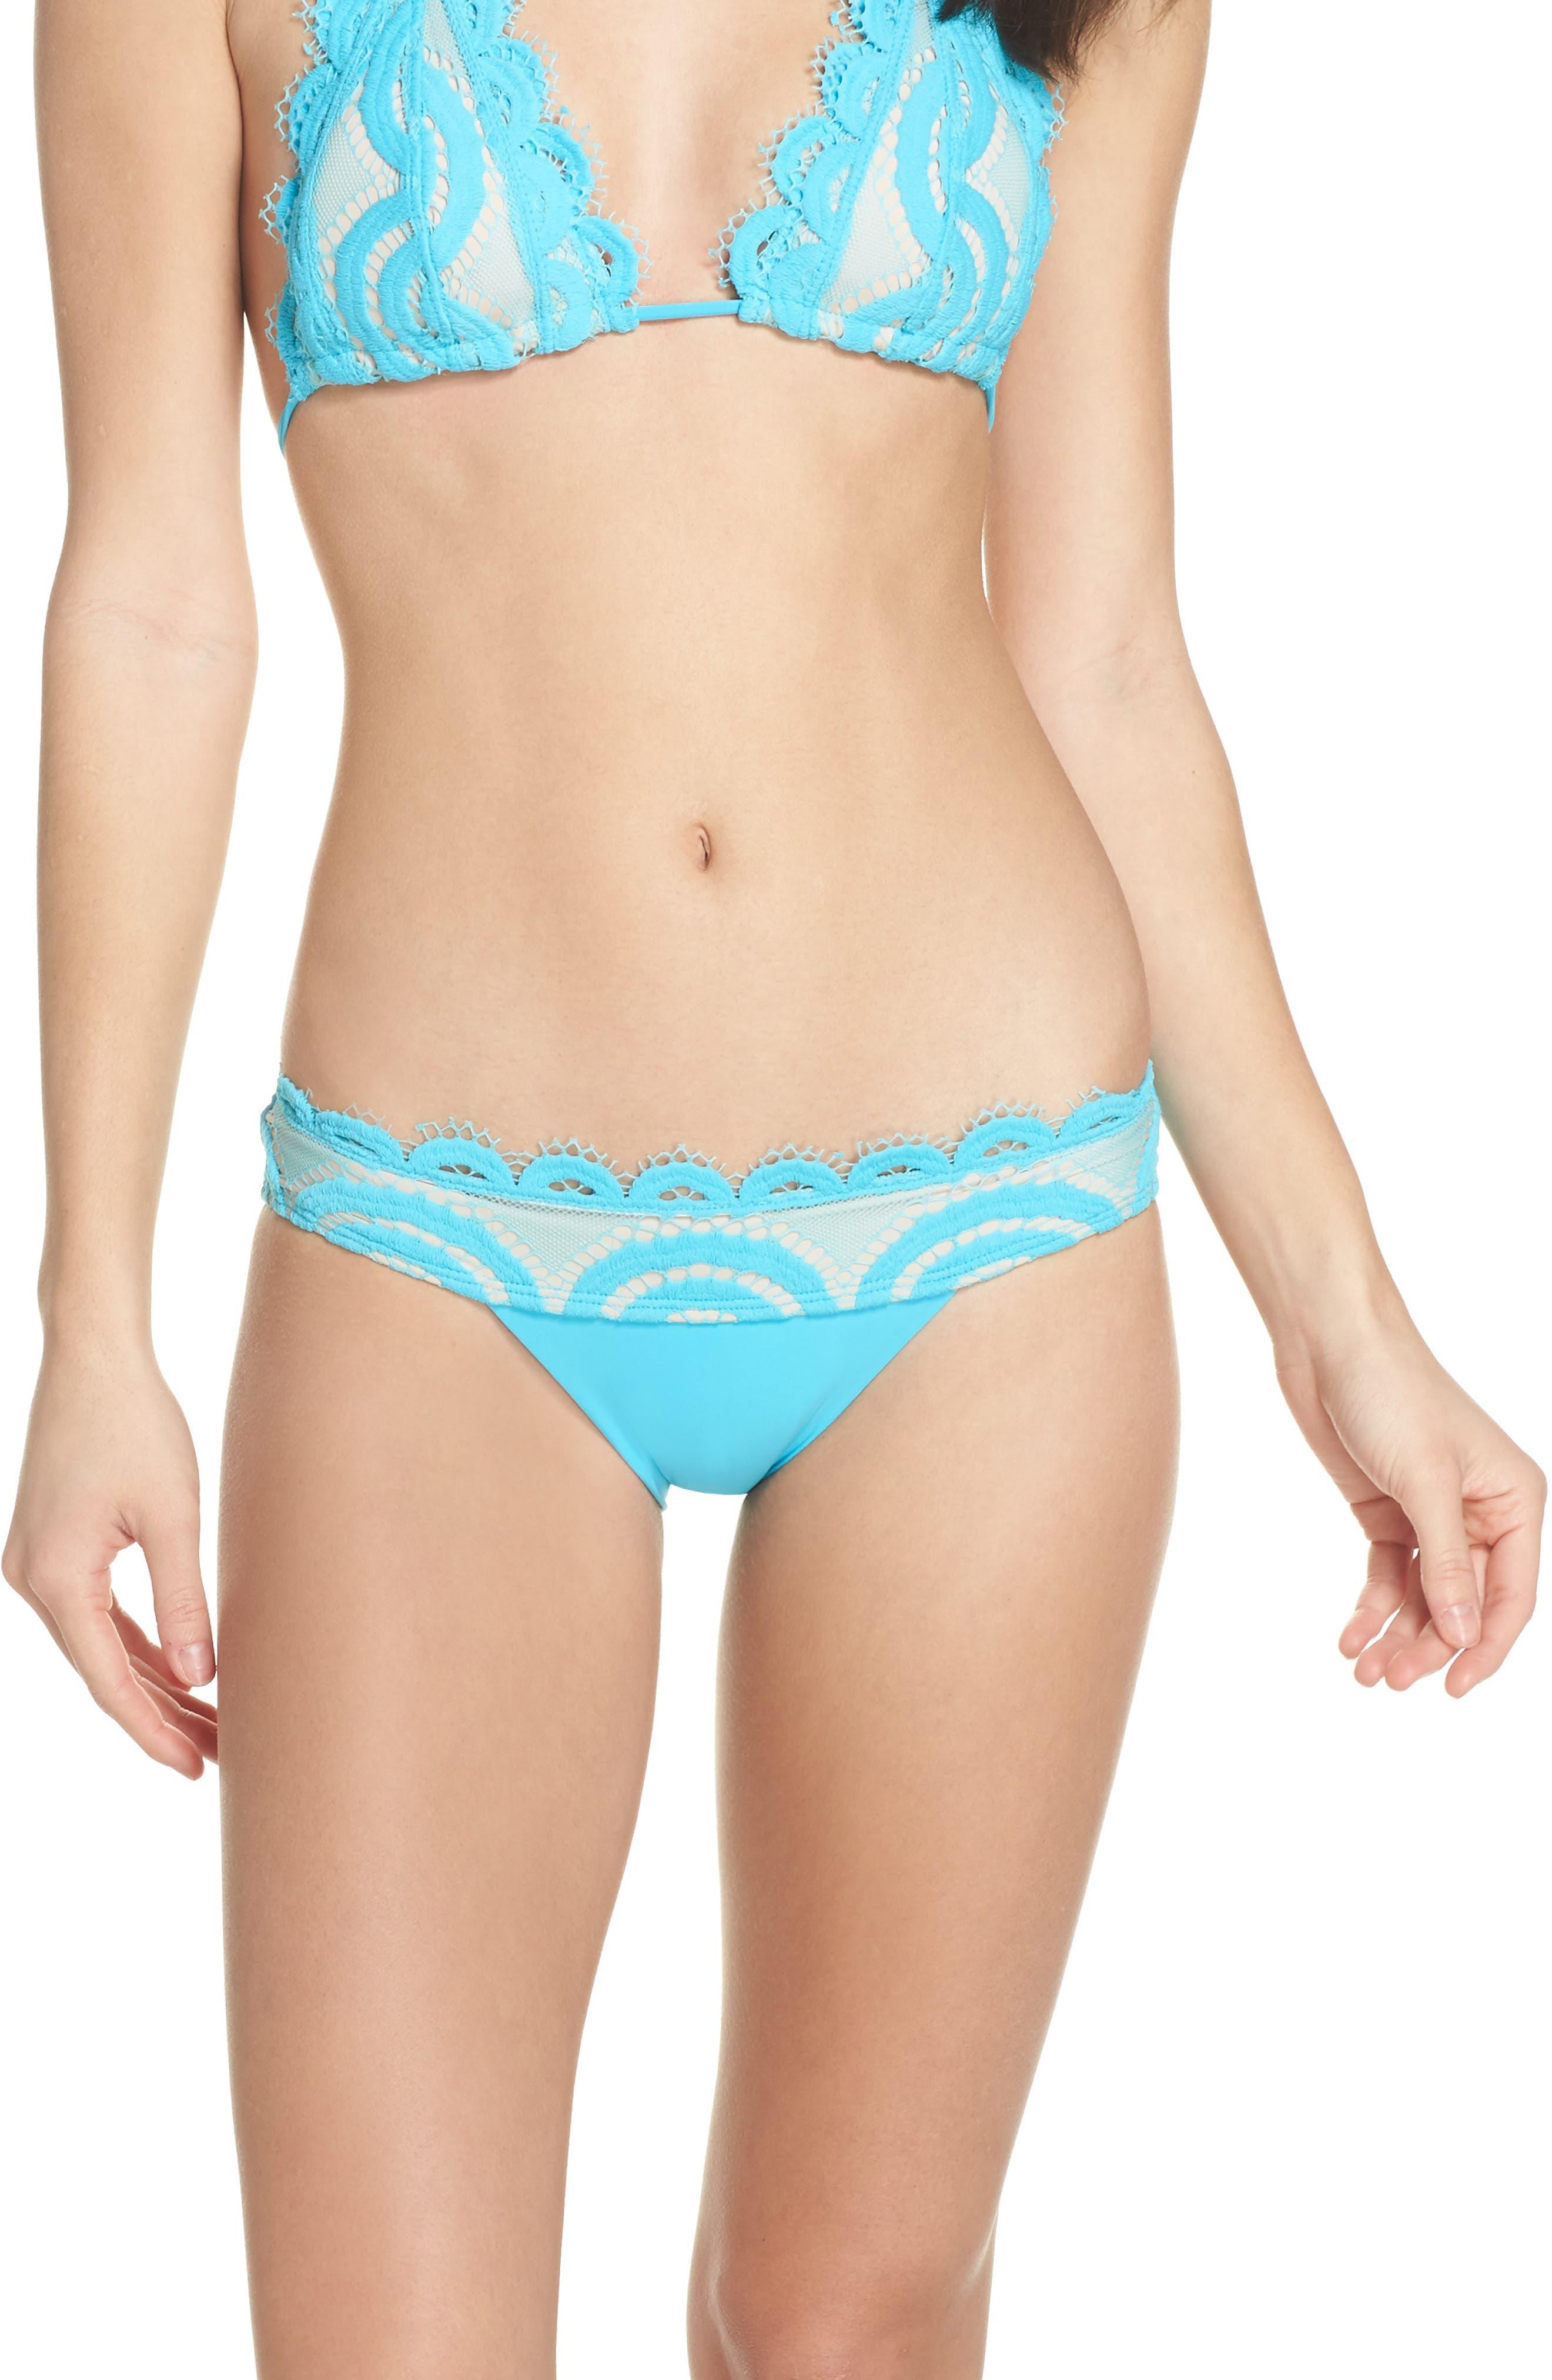 Banded Lace Bikini Bottoms,                             Main thumbnail 1, color,                             Marine